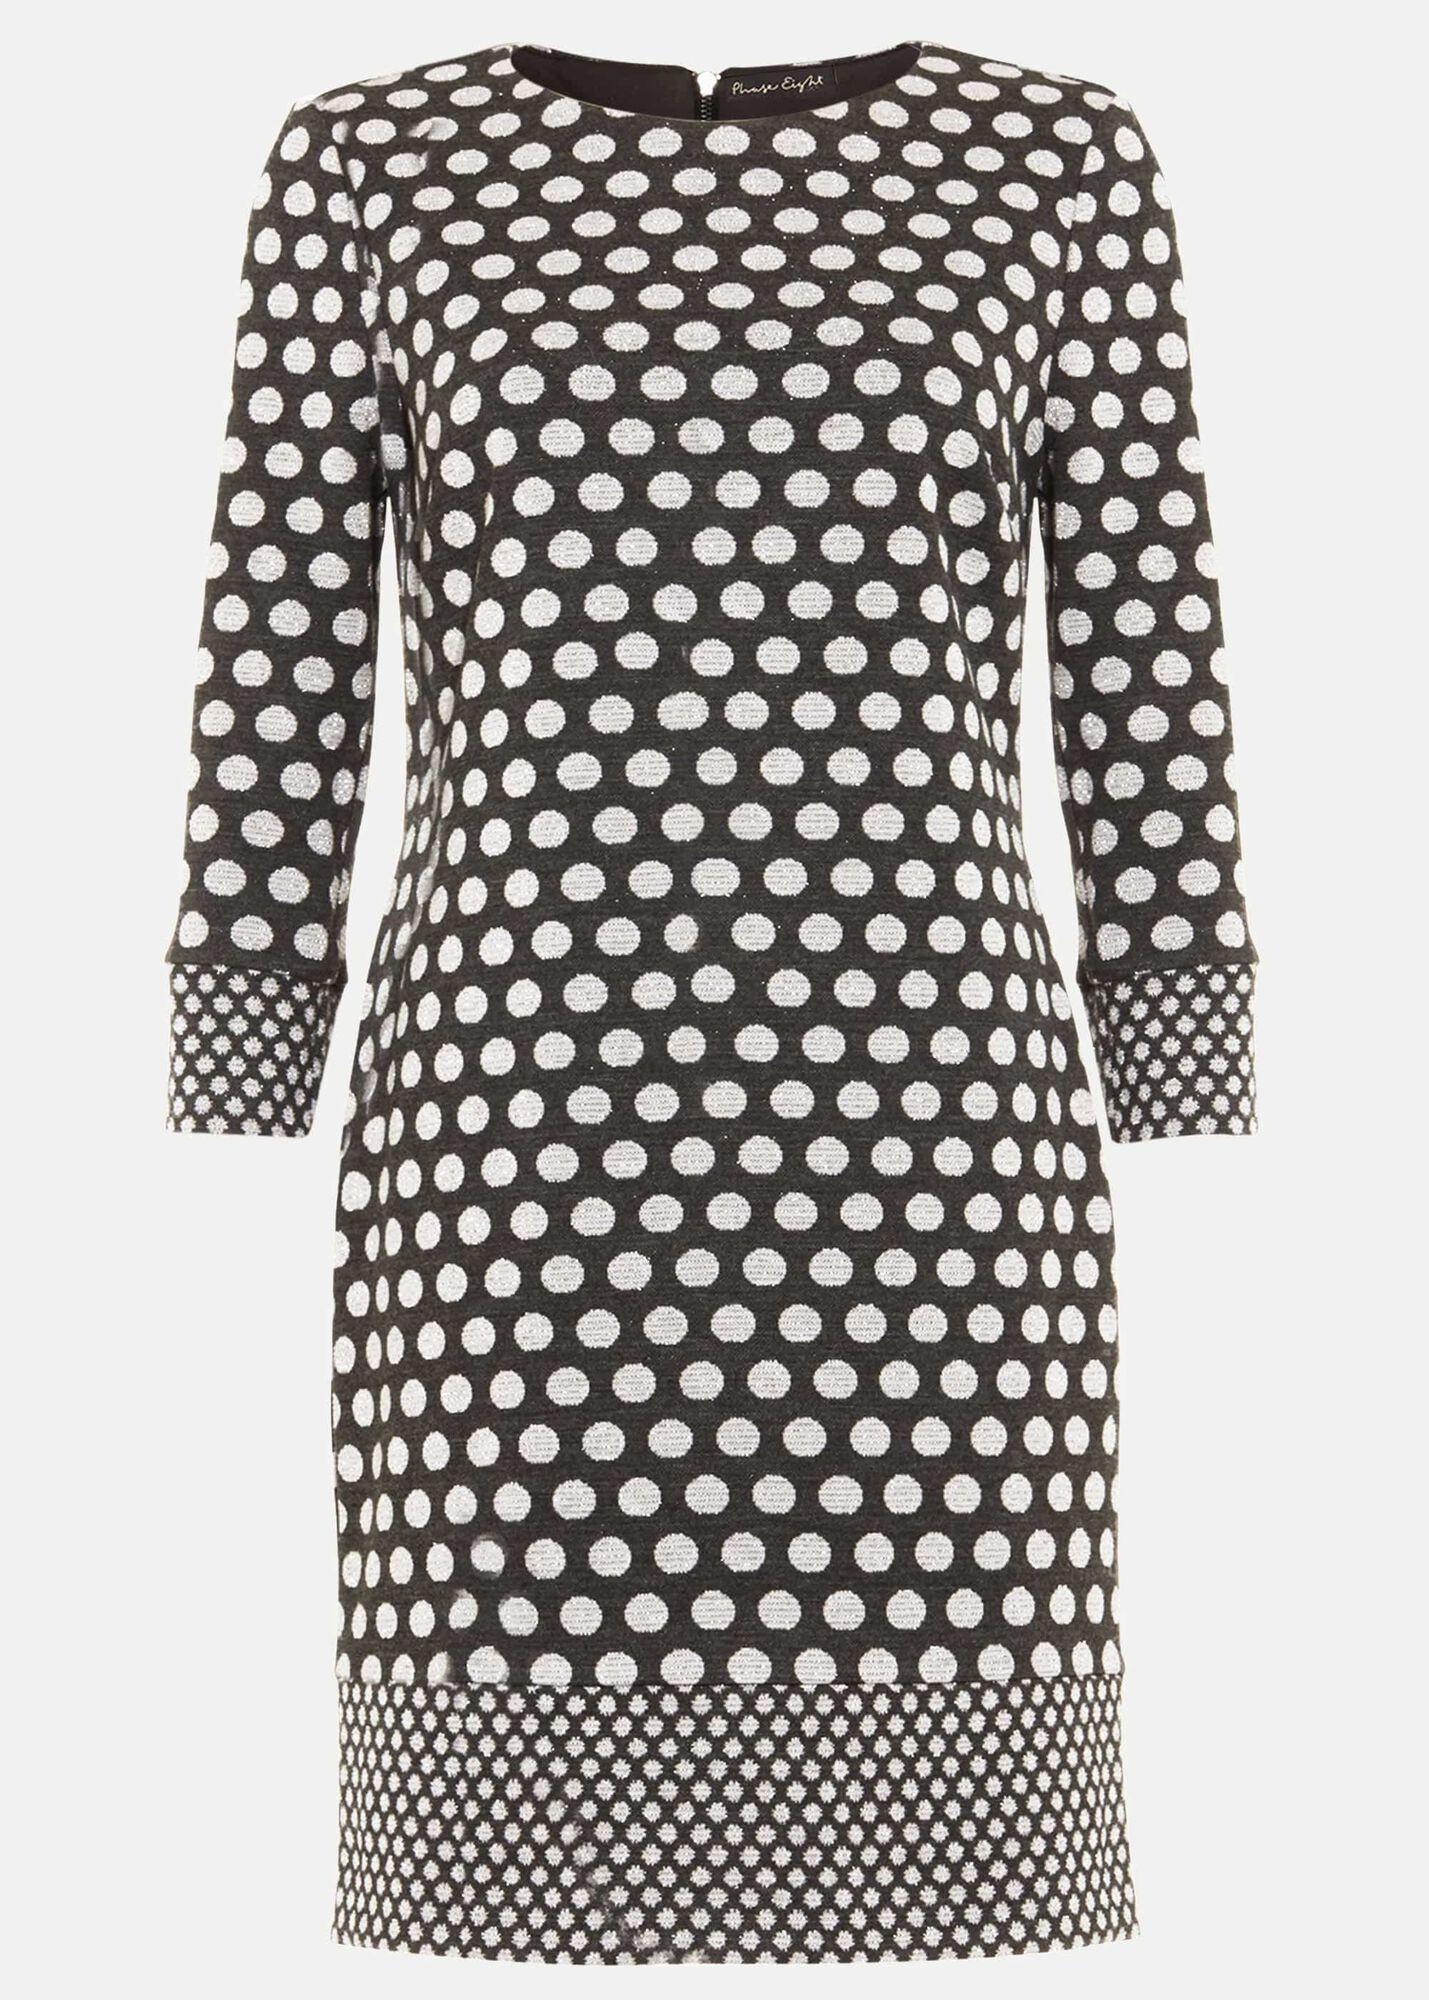 6ce49986a5b1b Sandy Spot Tunic Dress. Previous Next. Phase Eight